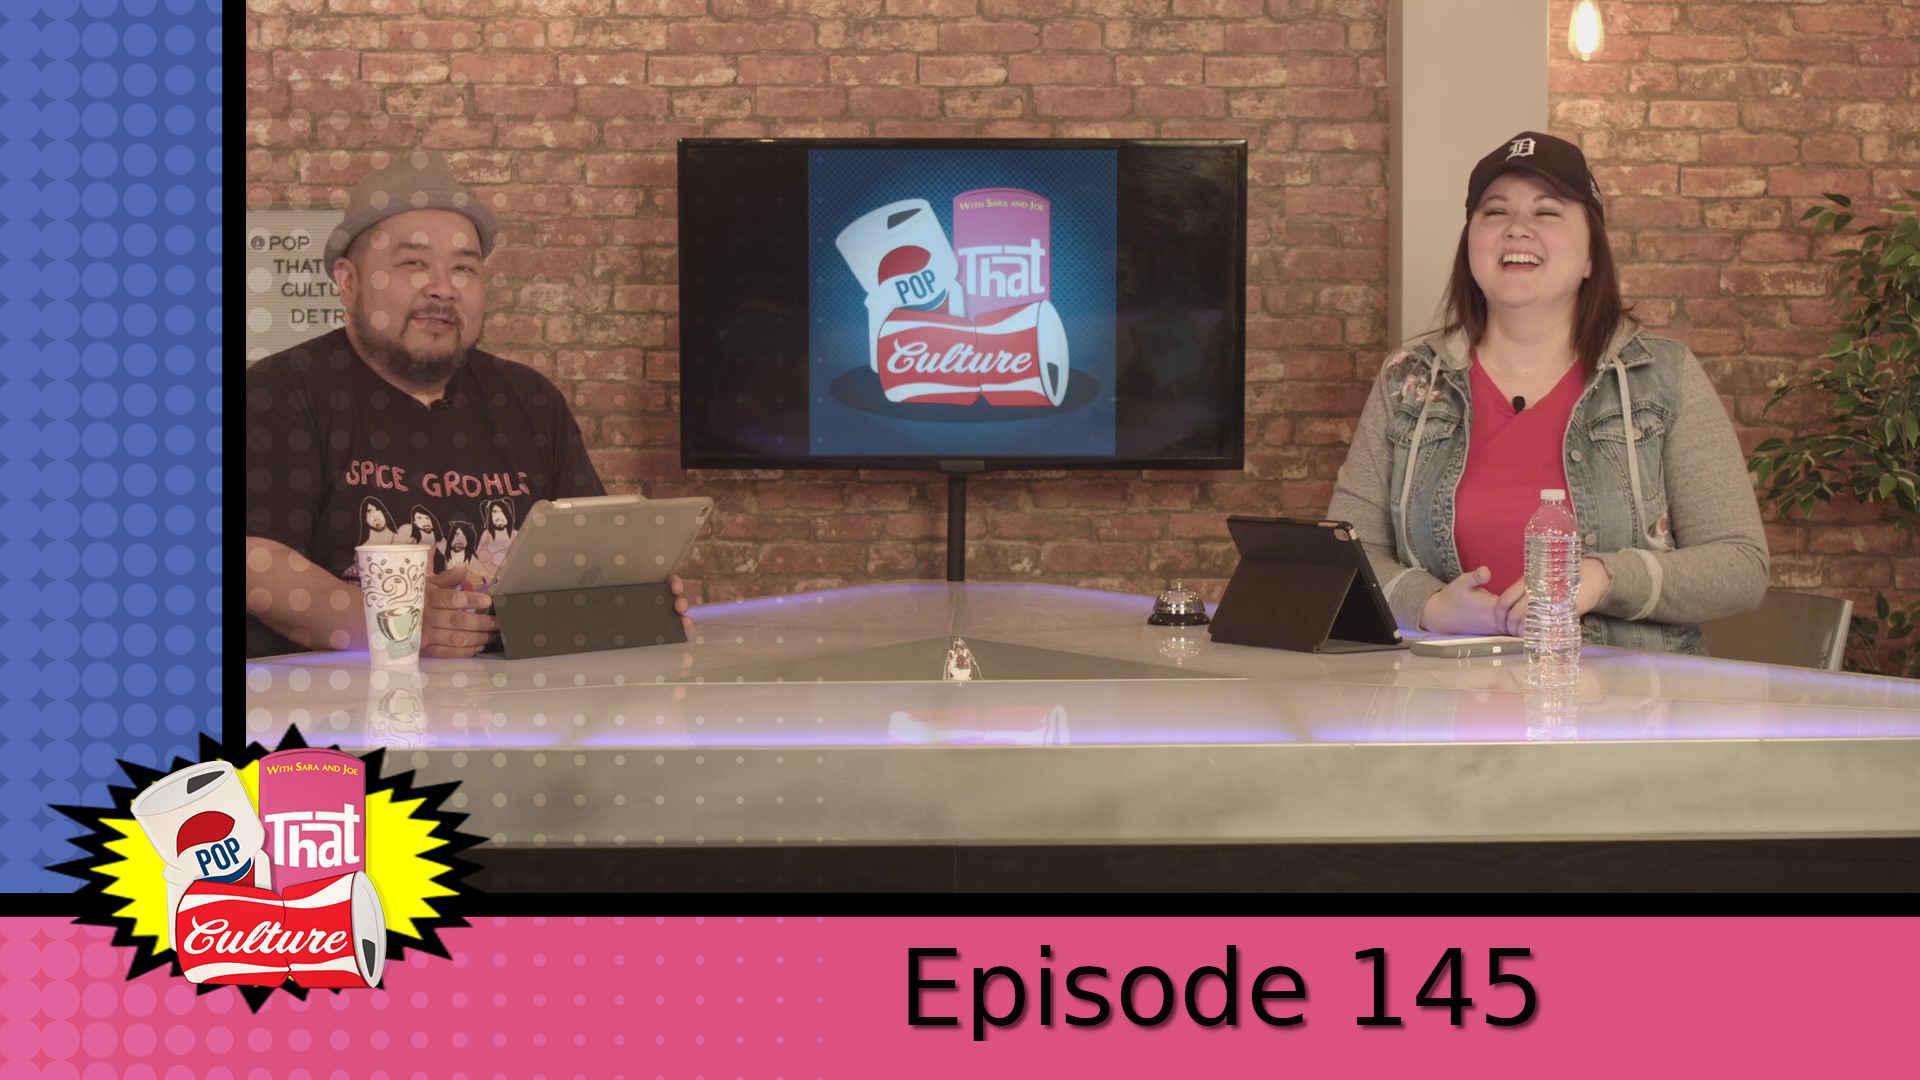 Pop That Culture - Episode 145